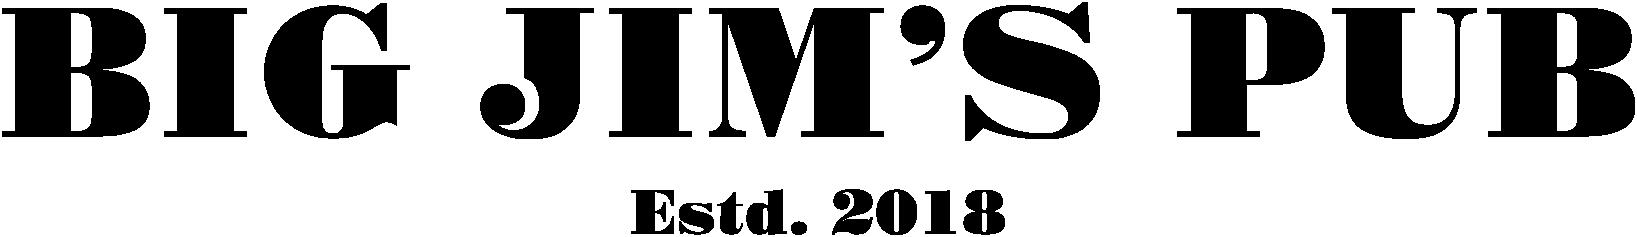 Вс-Чт 12:00 — 00:00 Пт-Сб 12:00 — 03:00